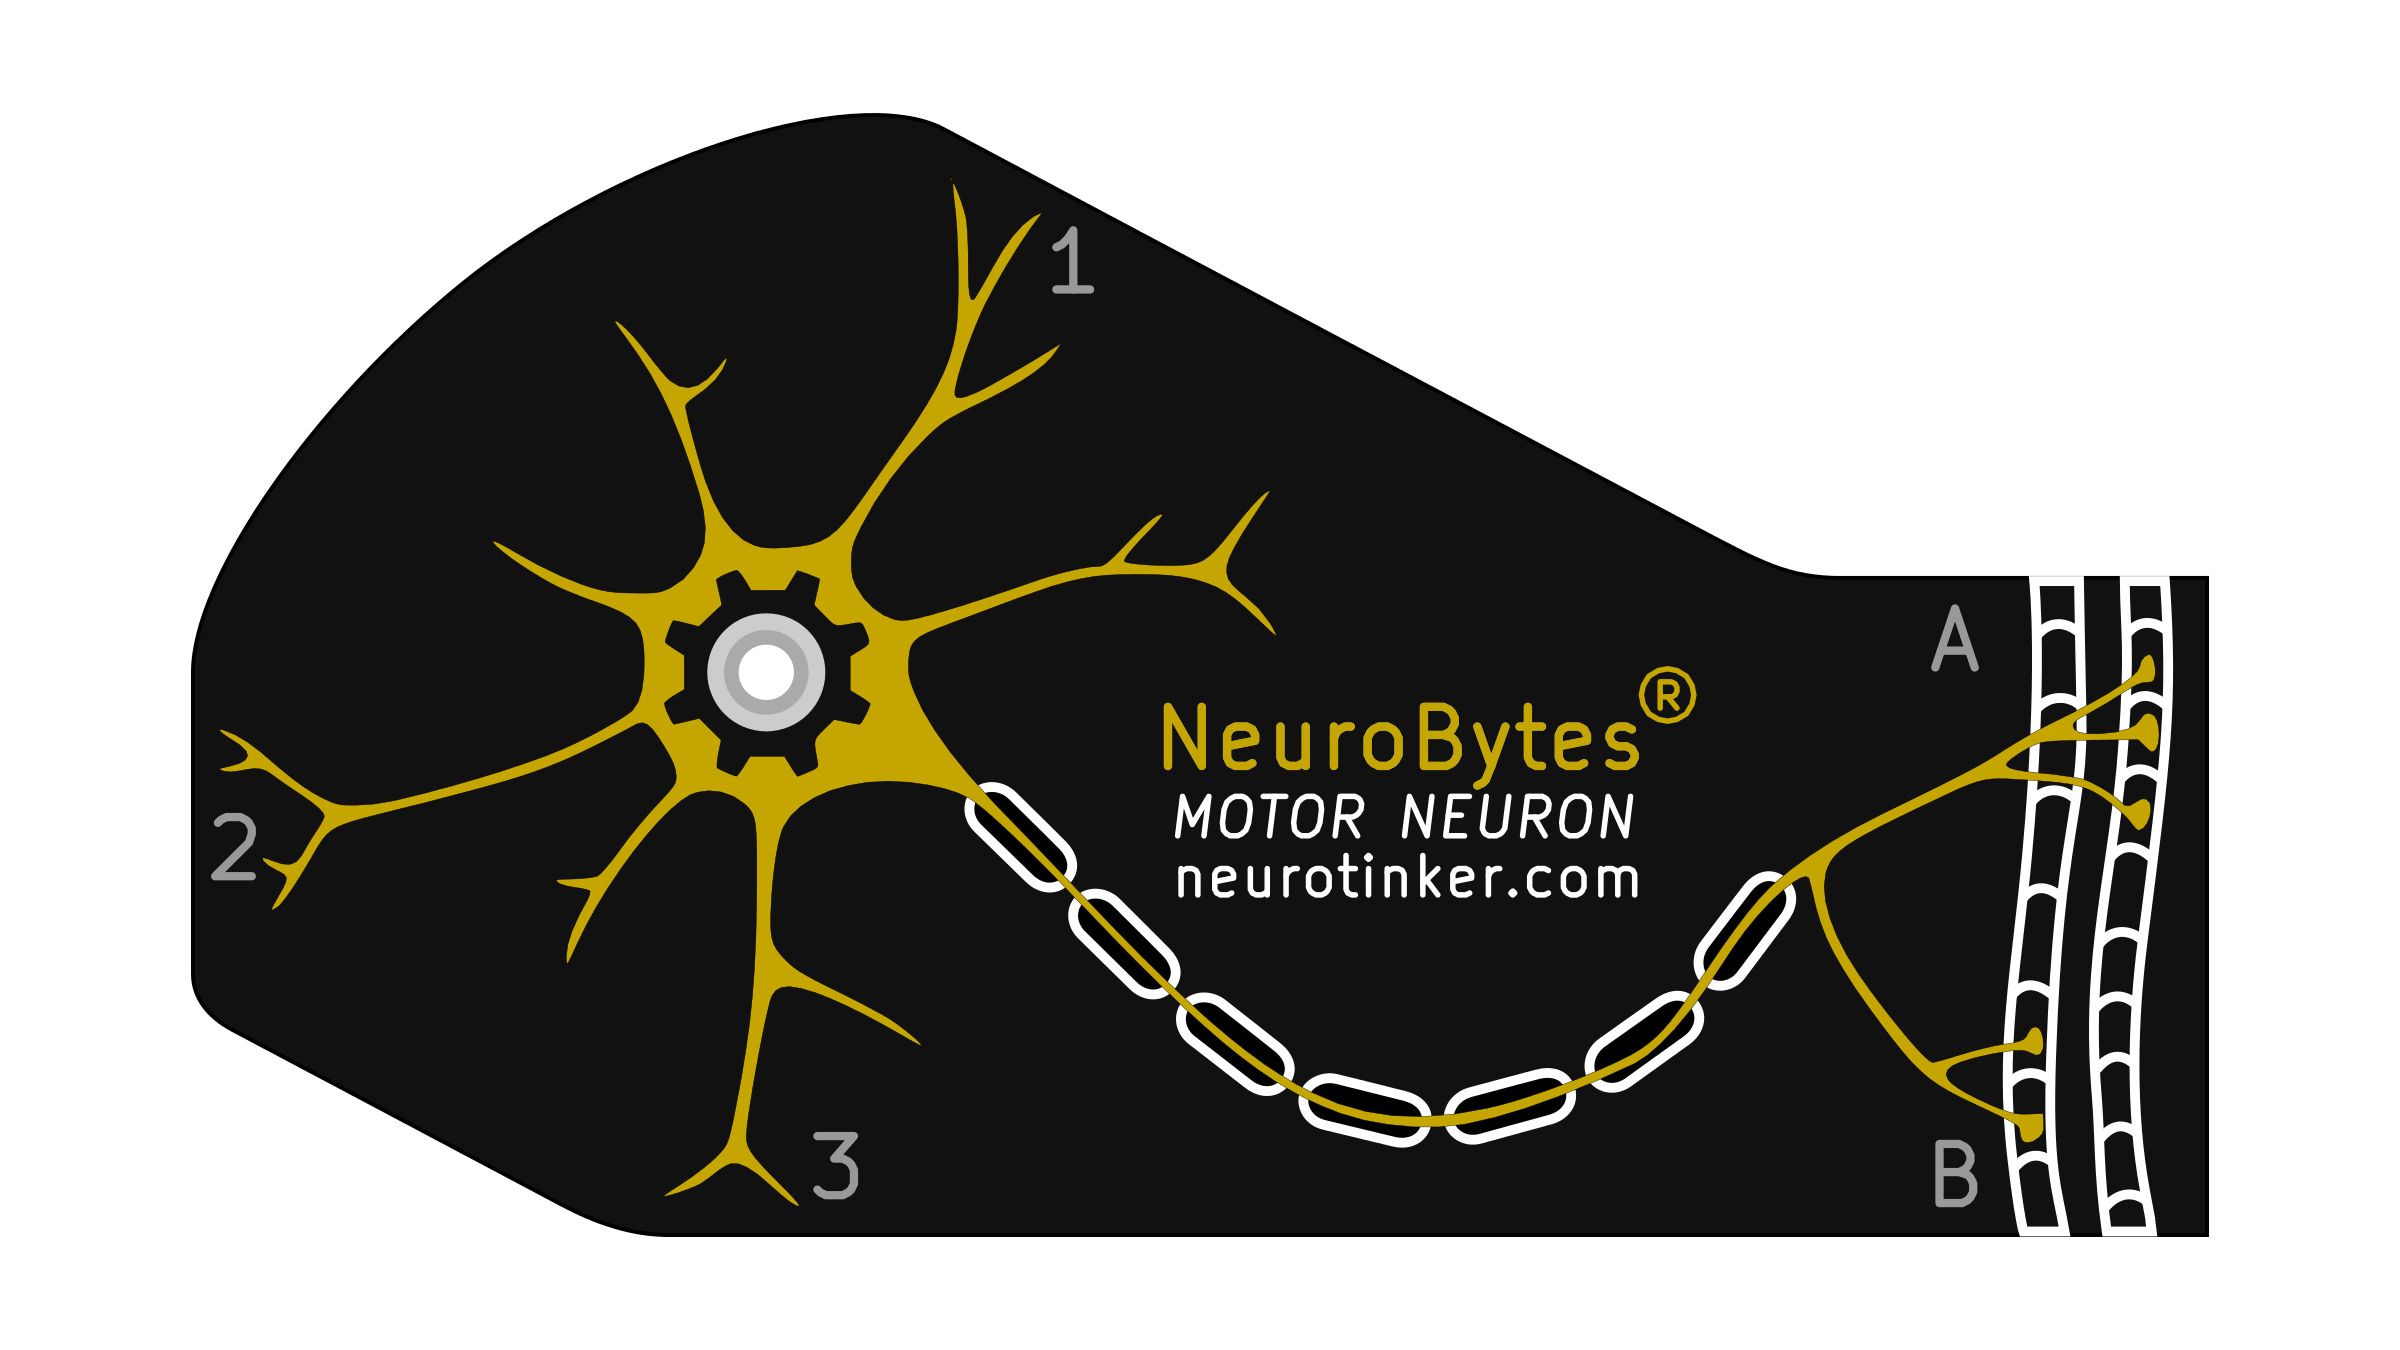 NeuroBytes_Motor_Neuron.png